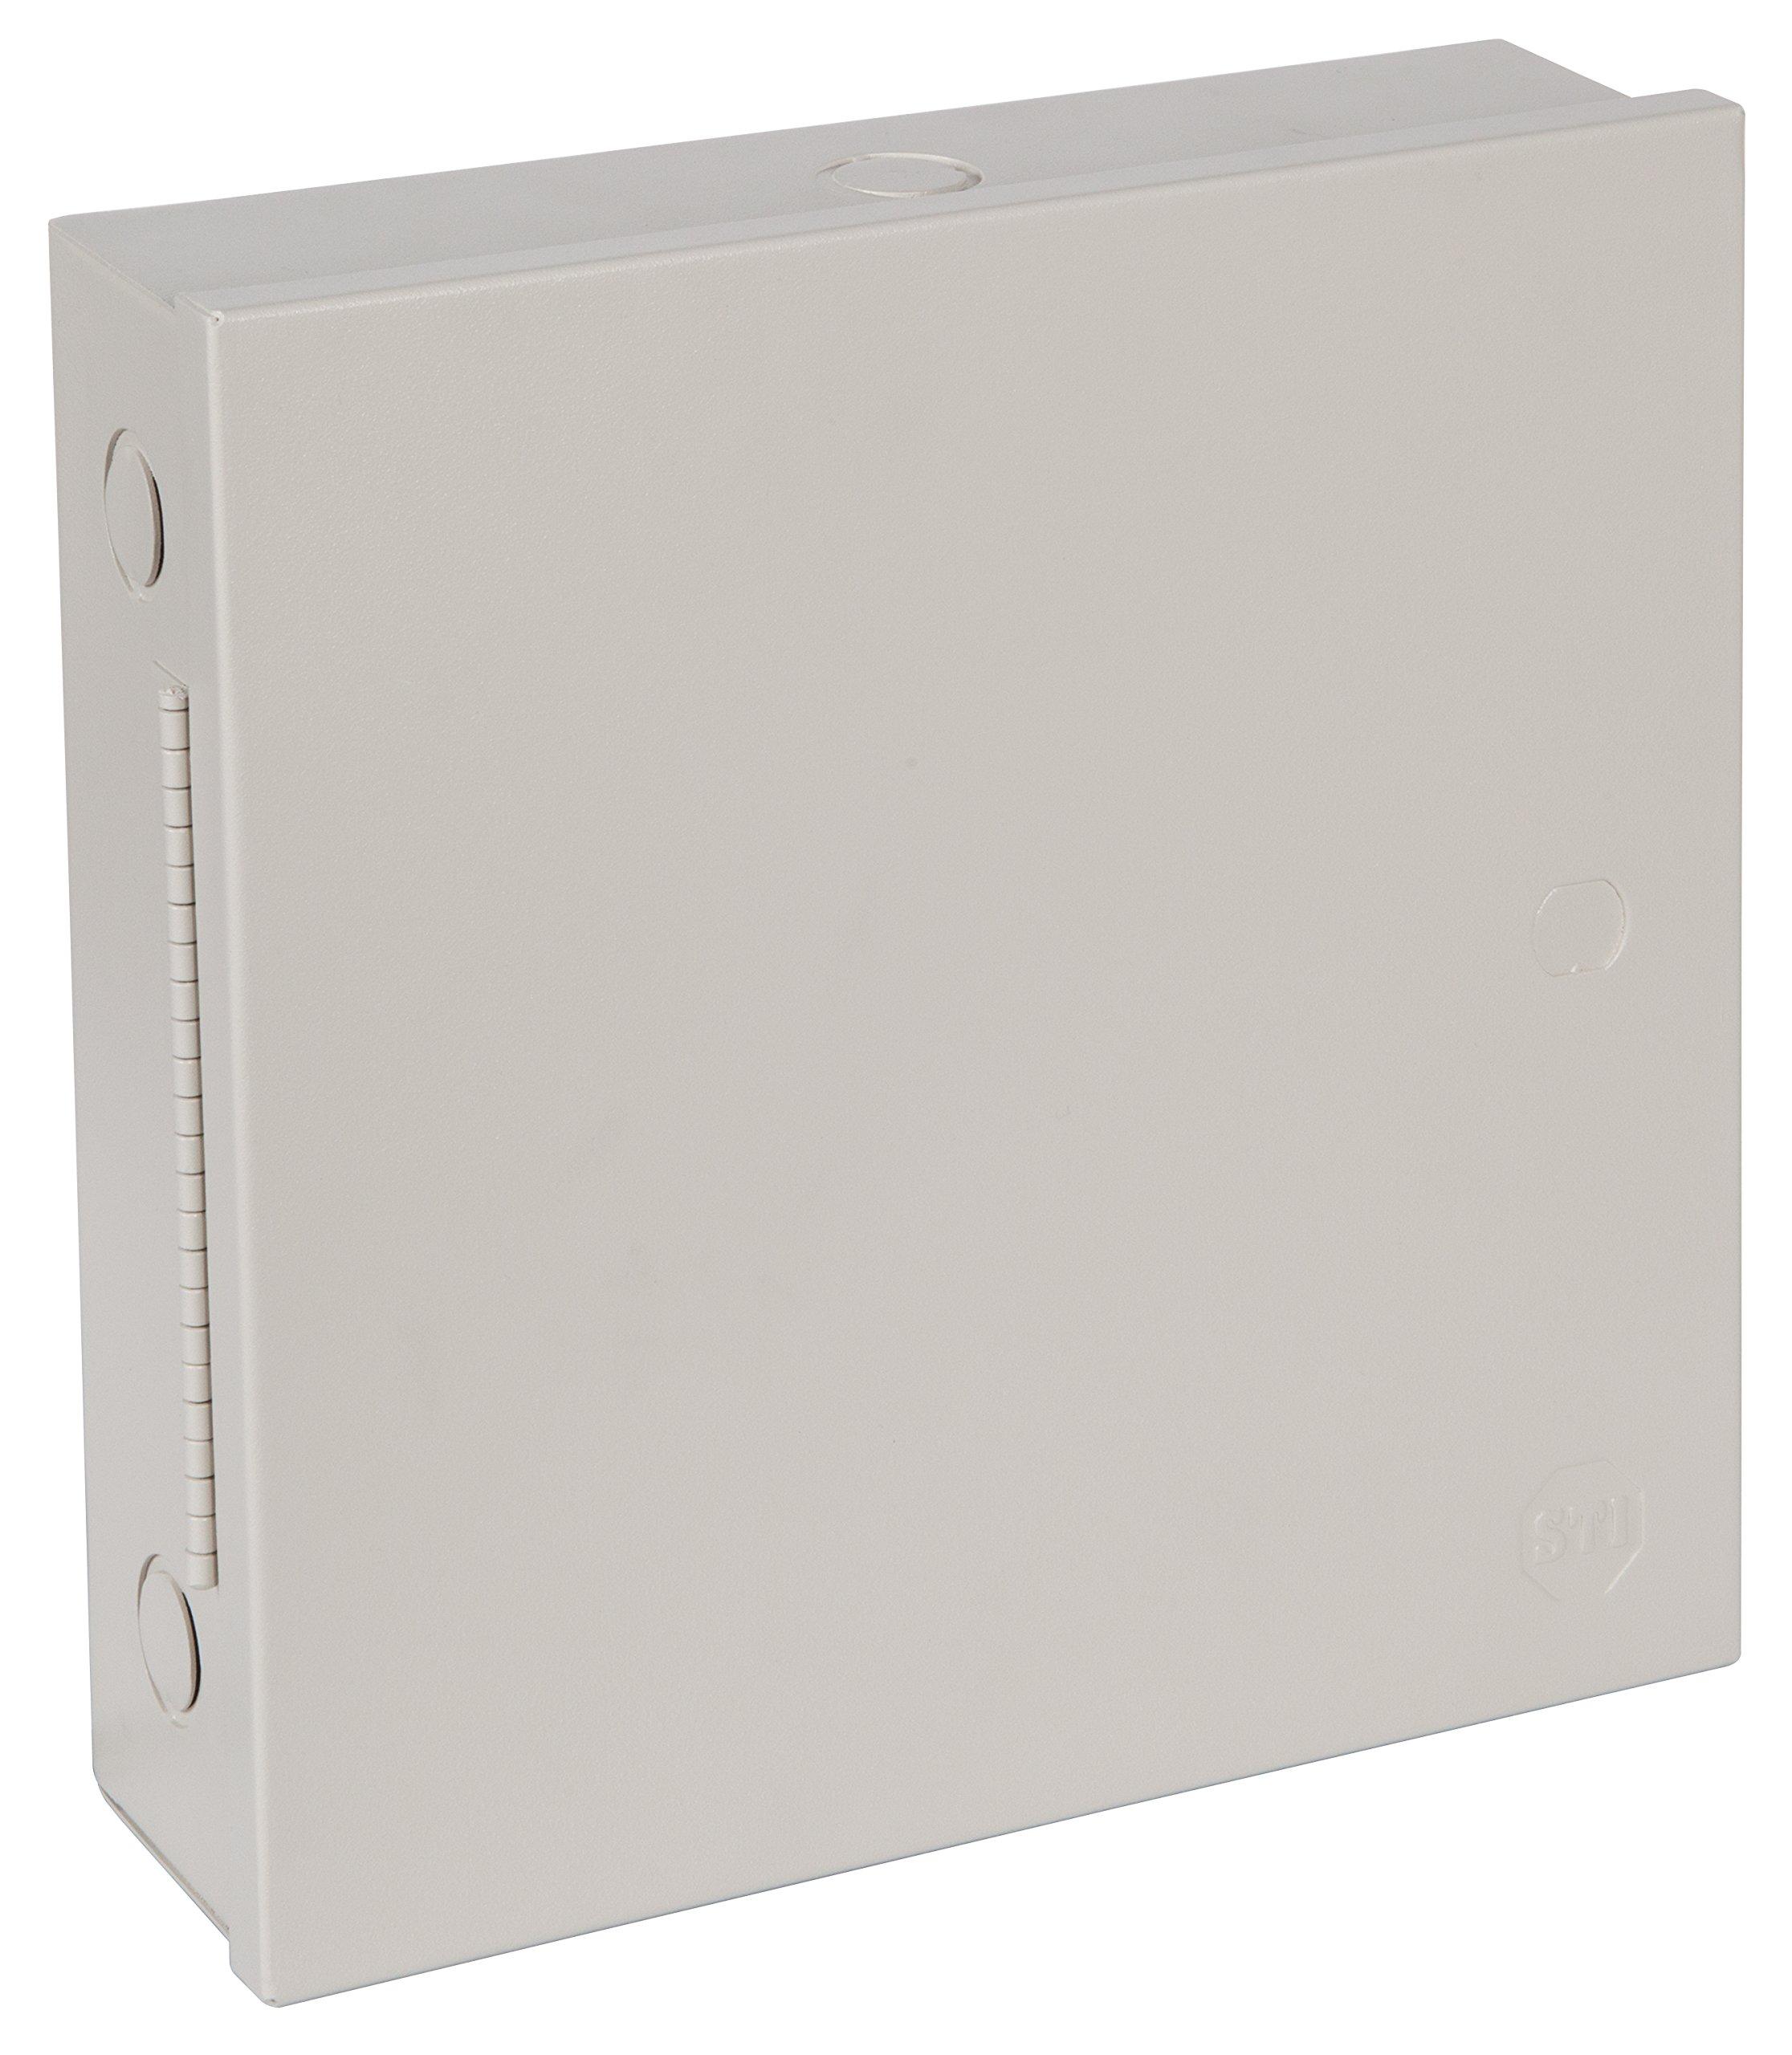 "Safety Technology International, Inc. STI-EM111103 Metal Protective Cabinet, UL/cUL Type1, Powder Coated, Piano Hinge, 11"" x 11"" x 3''"